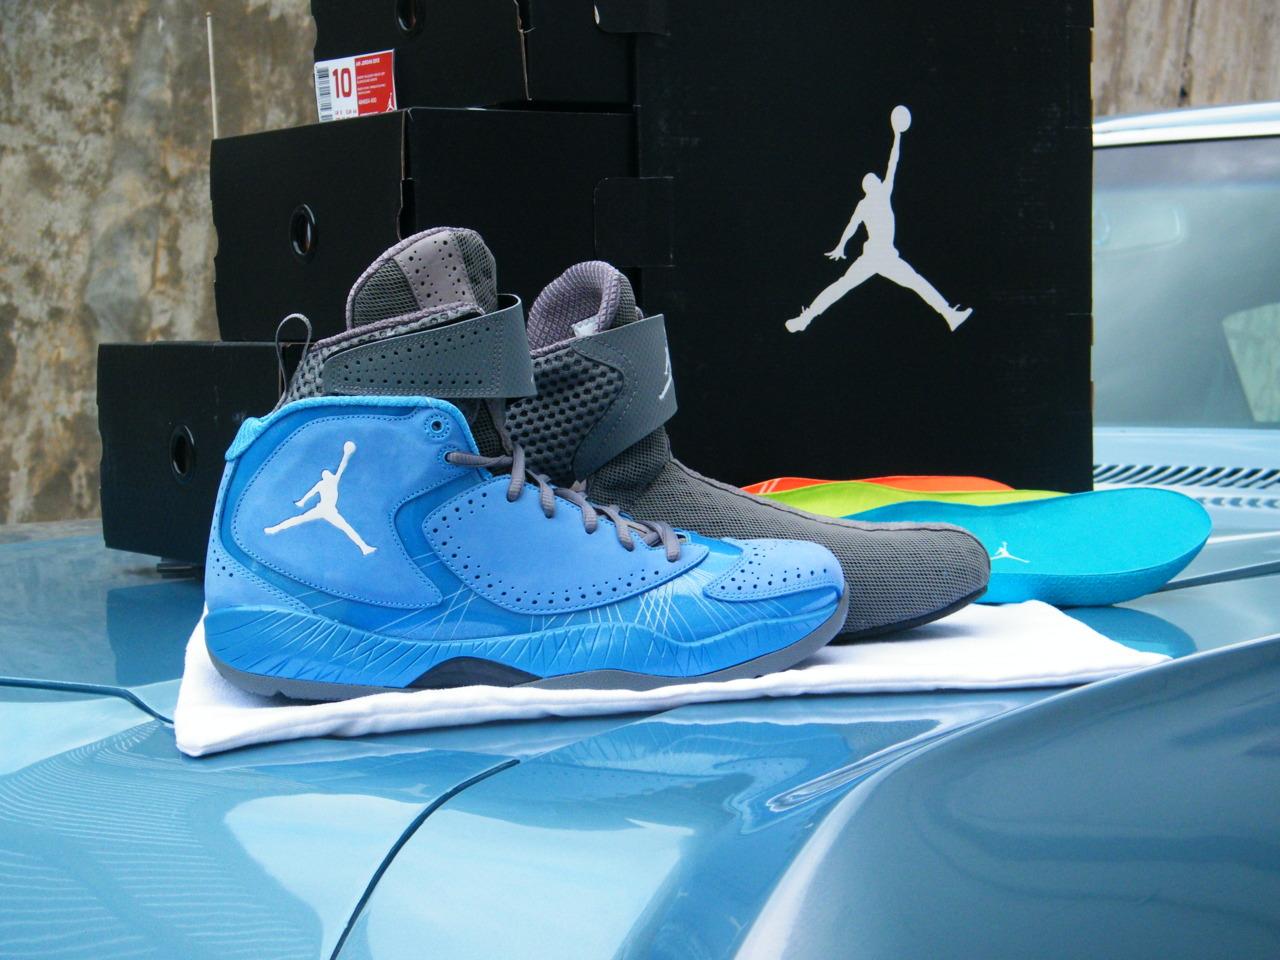 air jordan 2012 unc basketball shoes